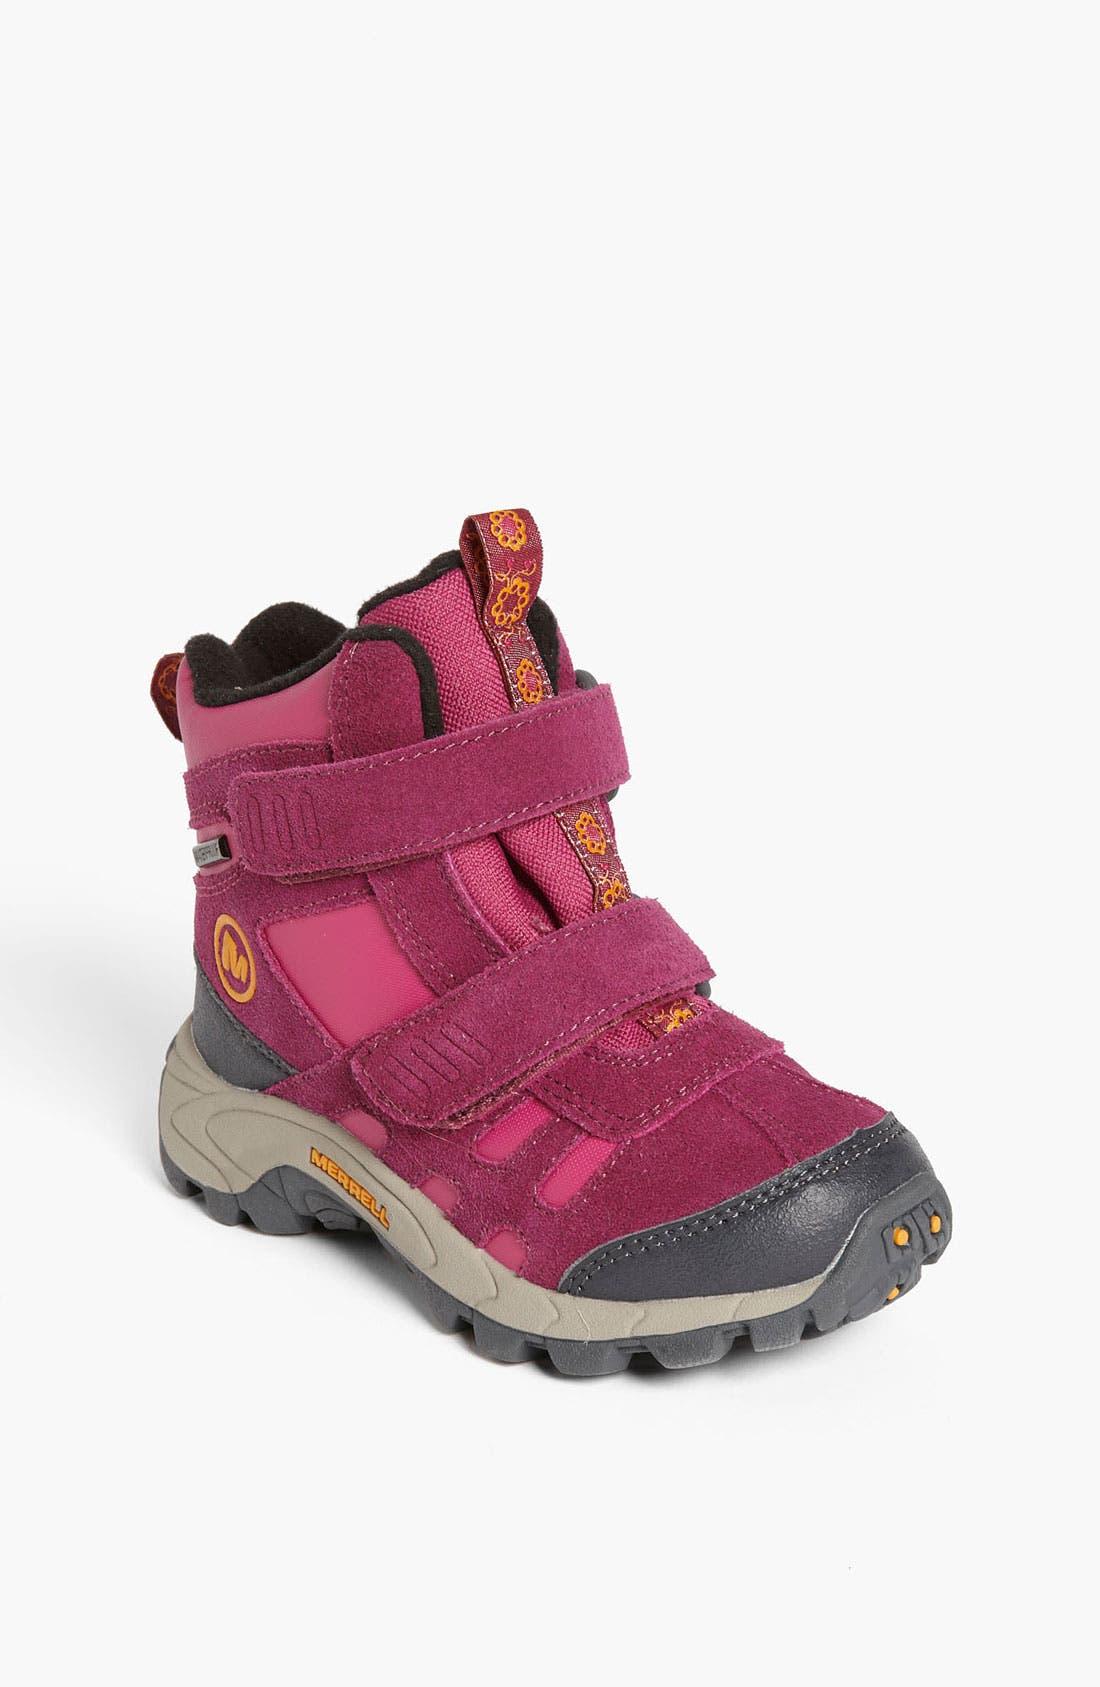 Alternate Image 1 Selected - Merrell 'Moab Polar Short Strap' Waterproof Boot (Toddler, Little Kid & Big Kid)